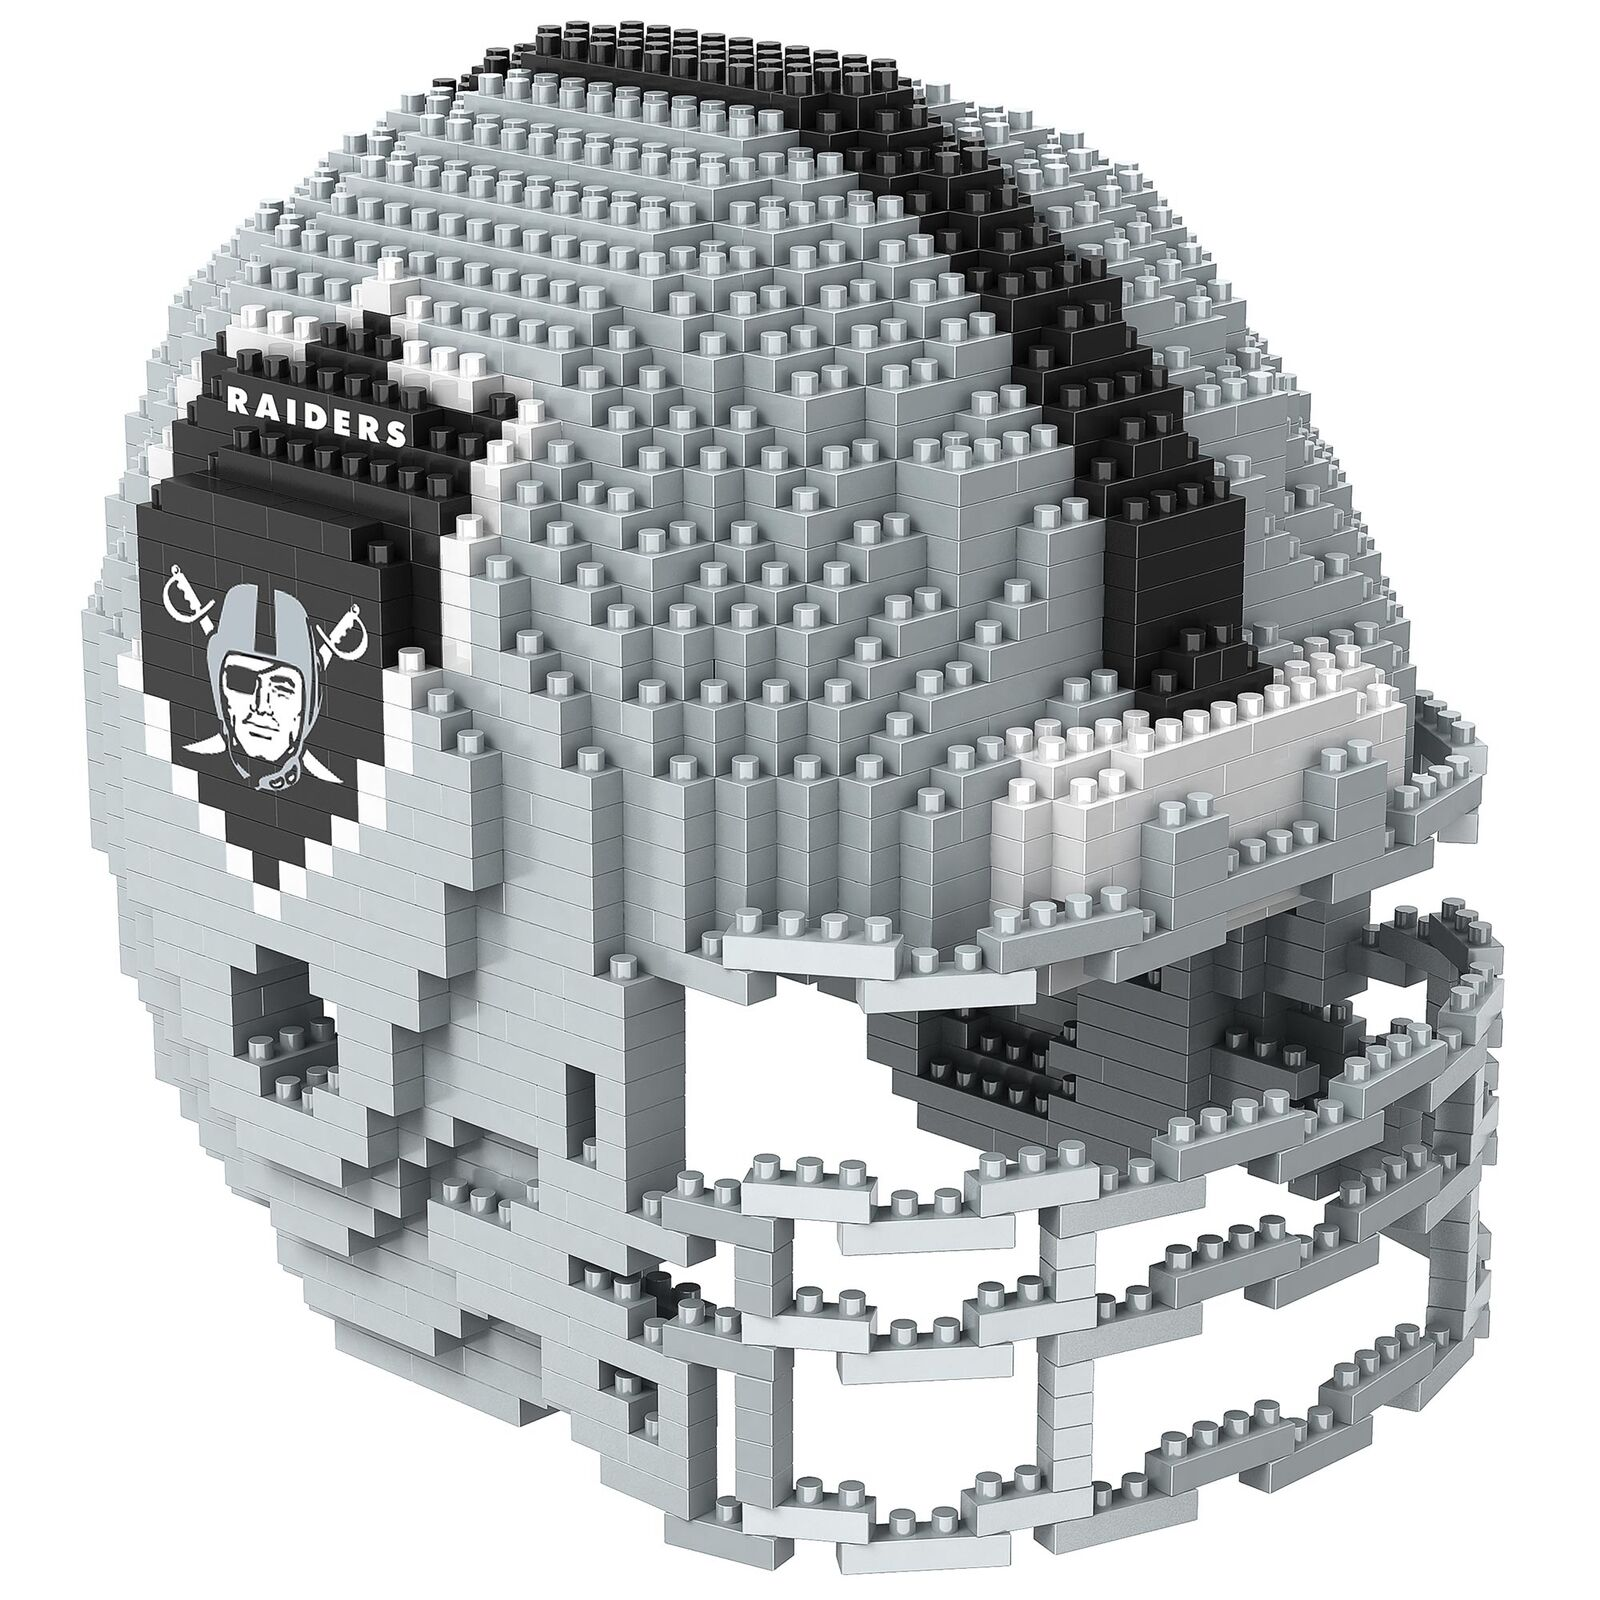 NFL Oakland Raiders 3D BRXLZ Helm Fanartikel Fanartikel Fanartikel Bauset Baukasten Kinder Fanatics bf22b8